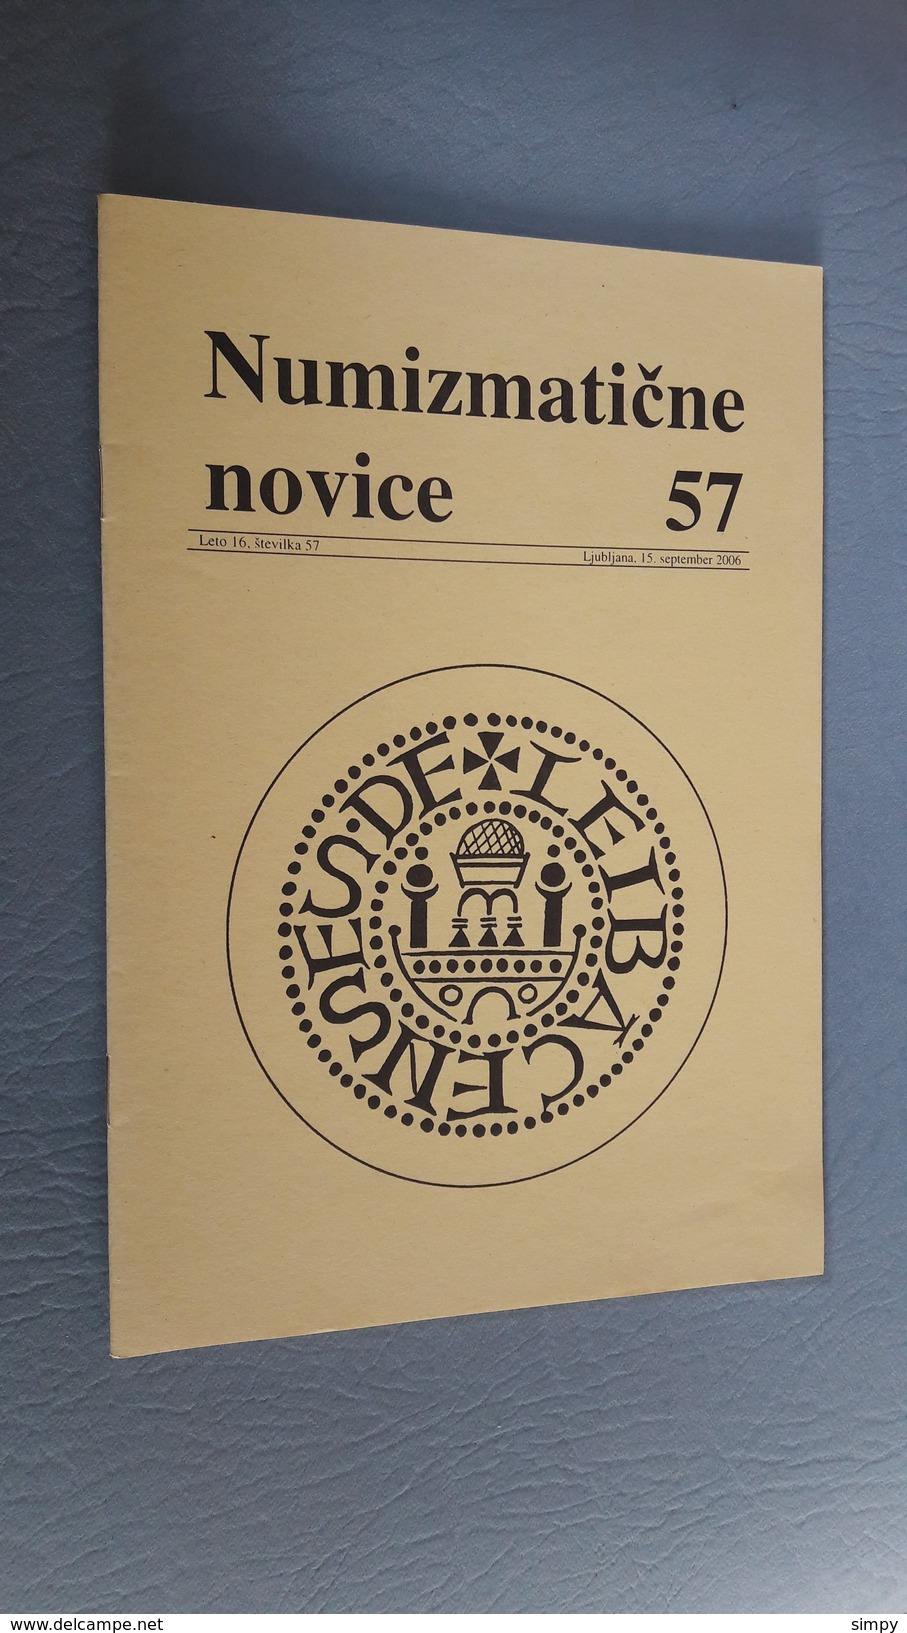 Slovenia Numismatic Bulletin Numizmaticne Novice 57 Ljubljana 2006 - Magazines: Subscriptions